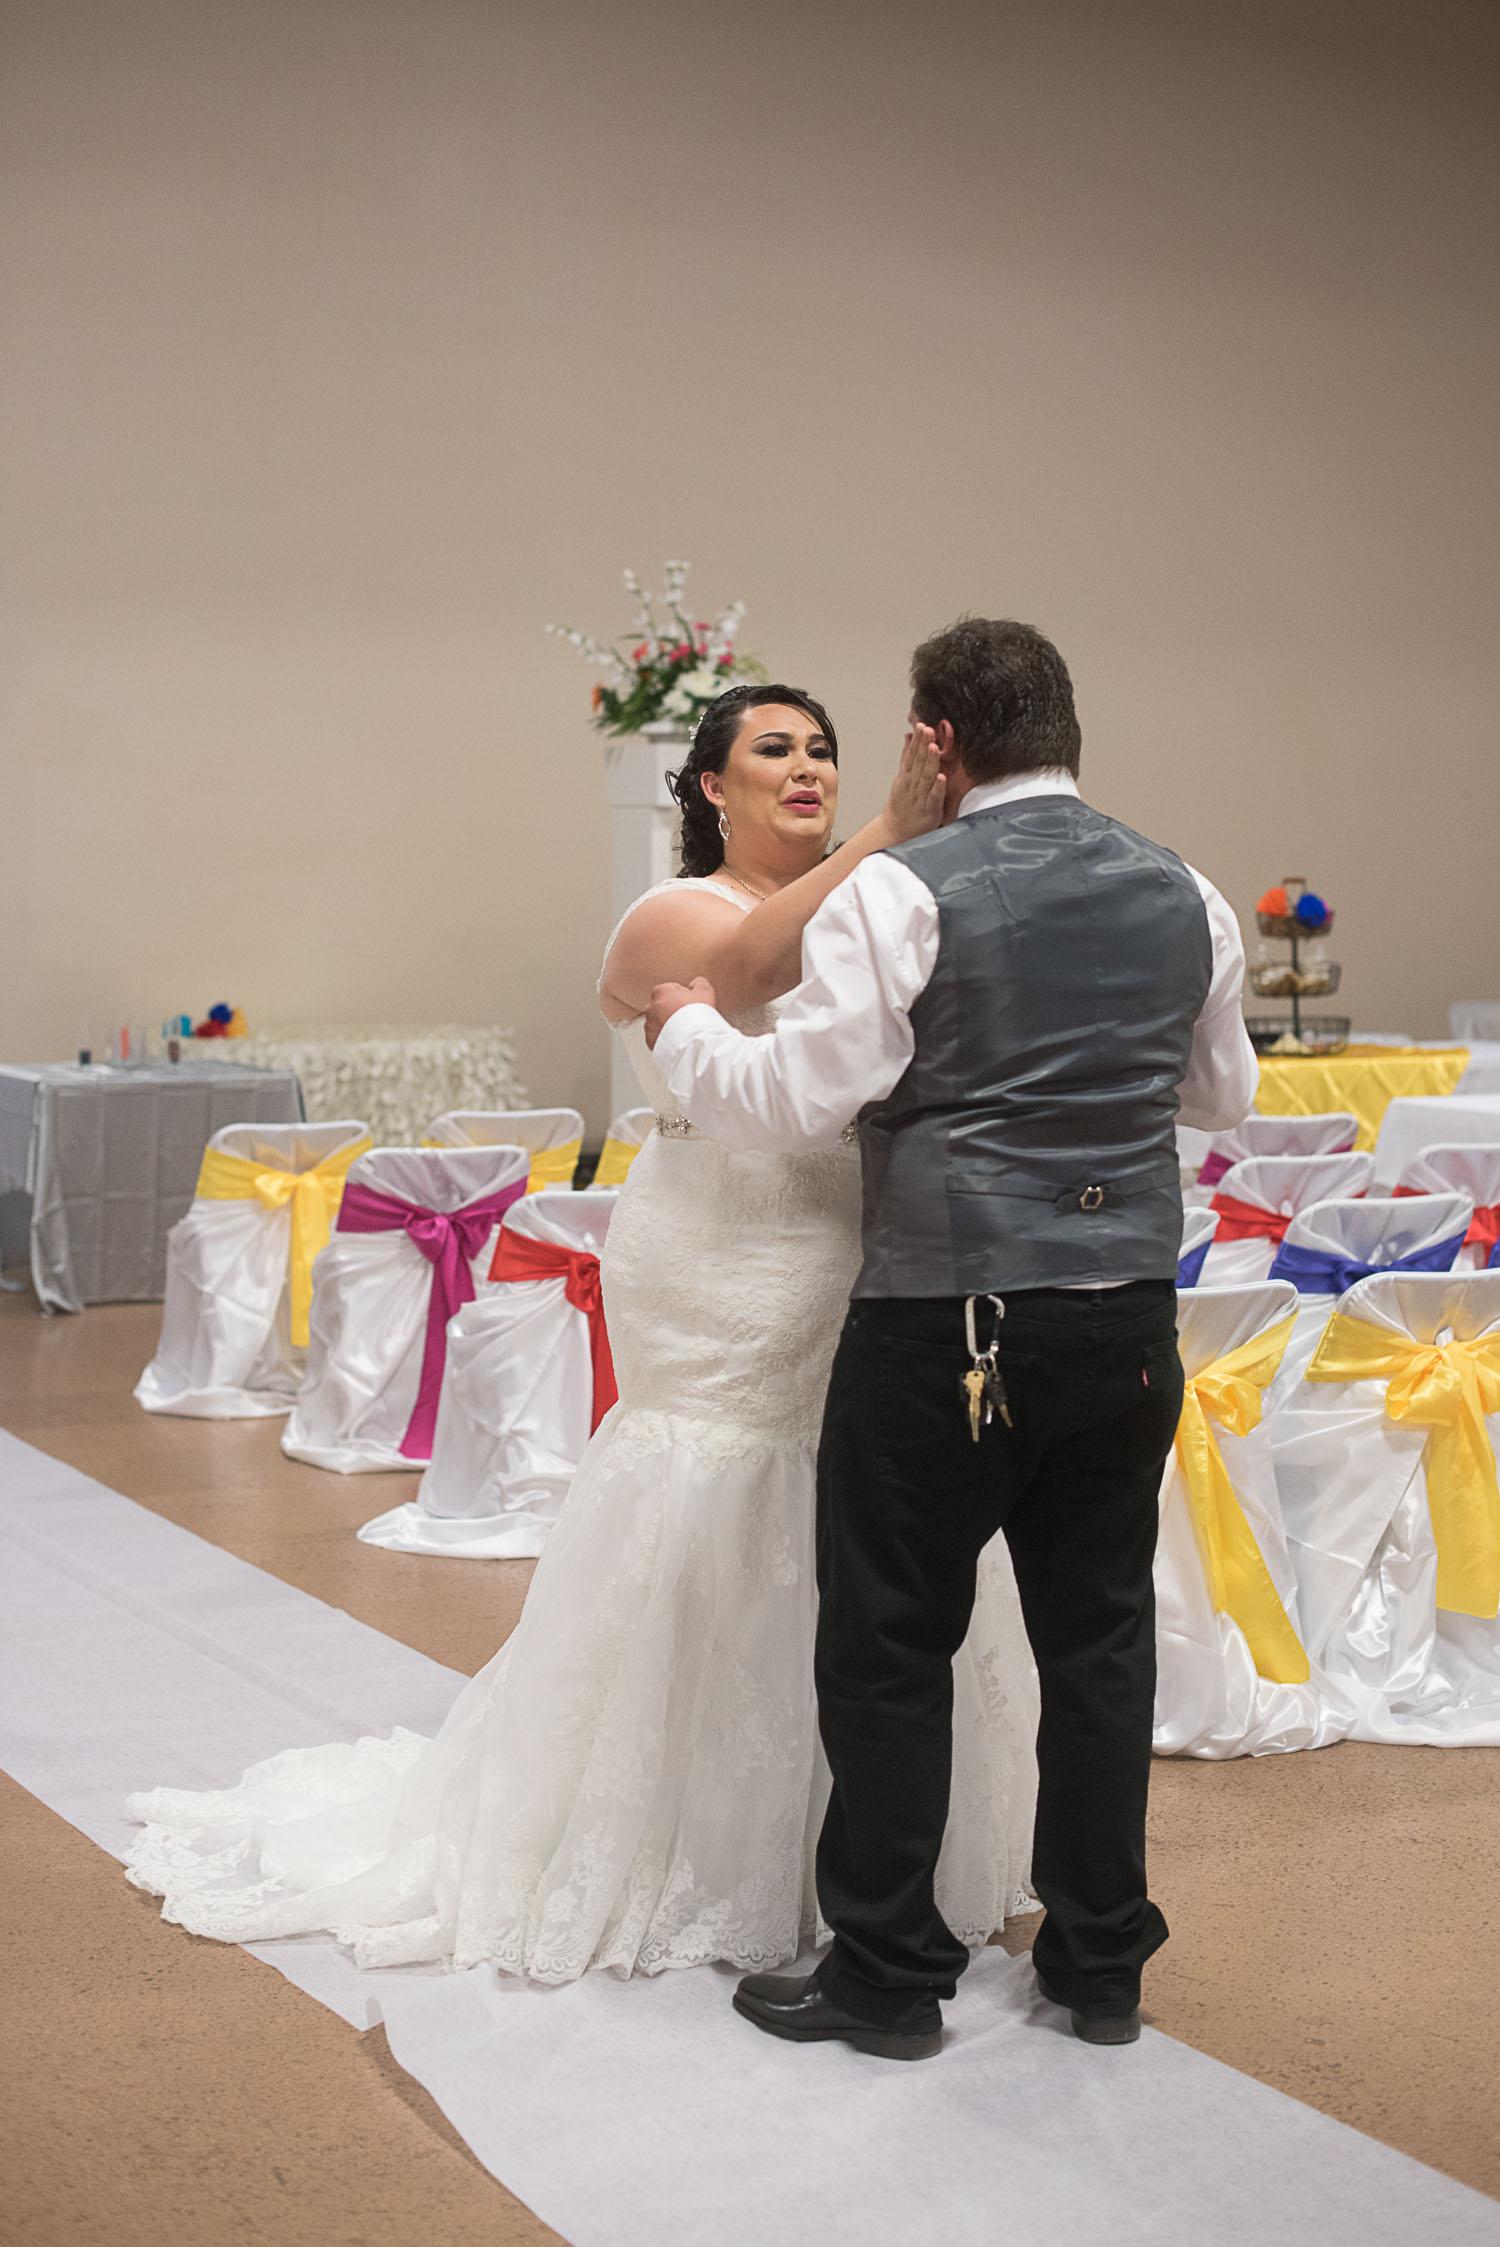 Leal Wedding Mira Visu Photography-68.jpg